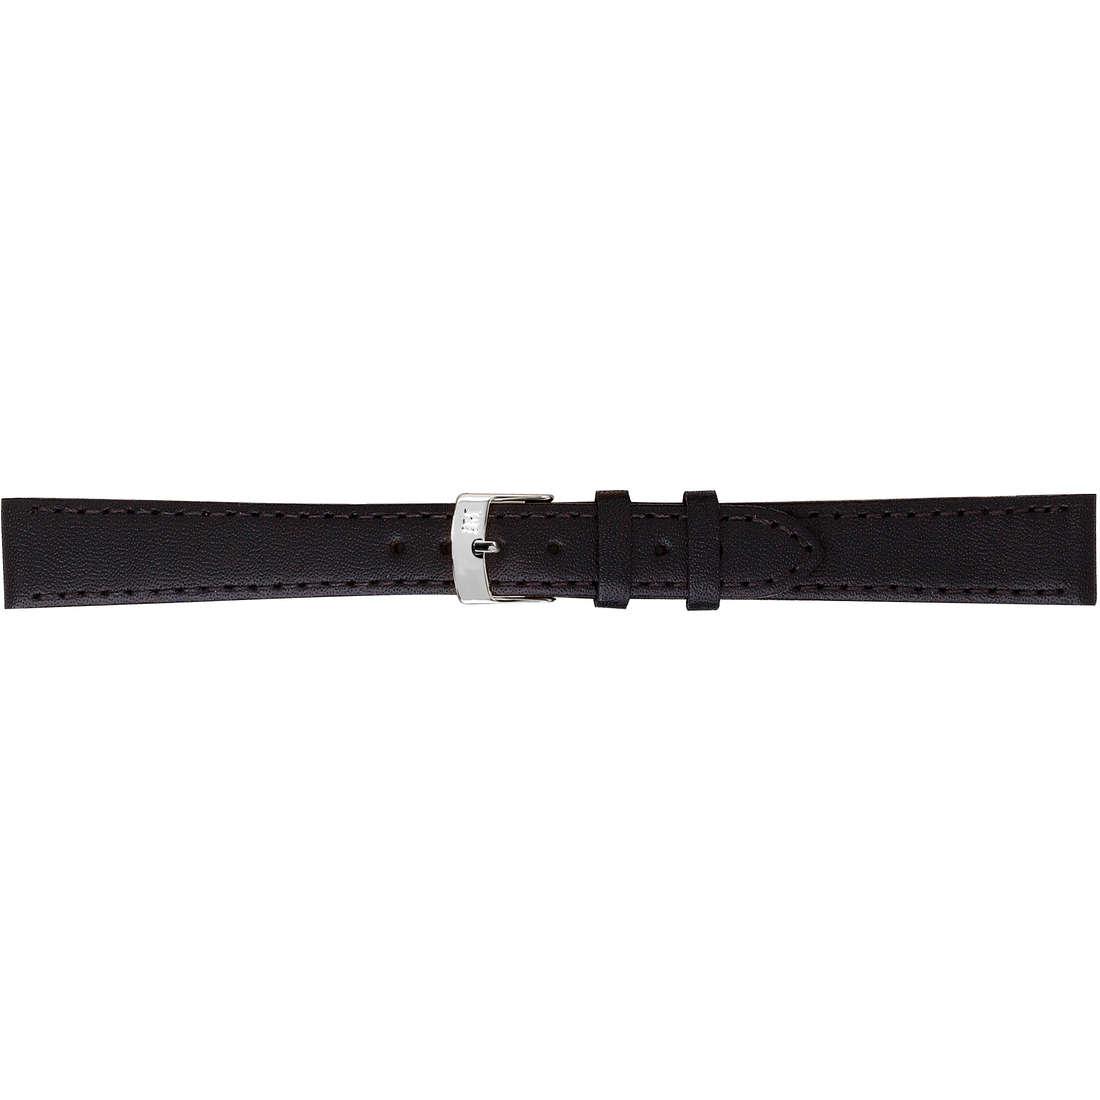 watch watch bands watch straps man Morellato Performance A01X2619875019CR18